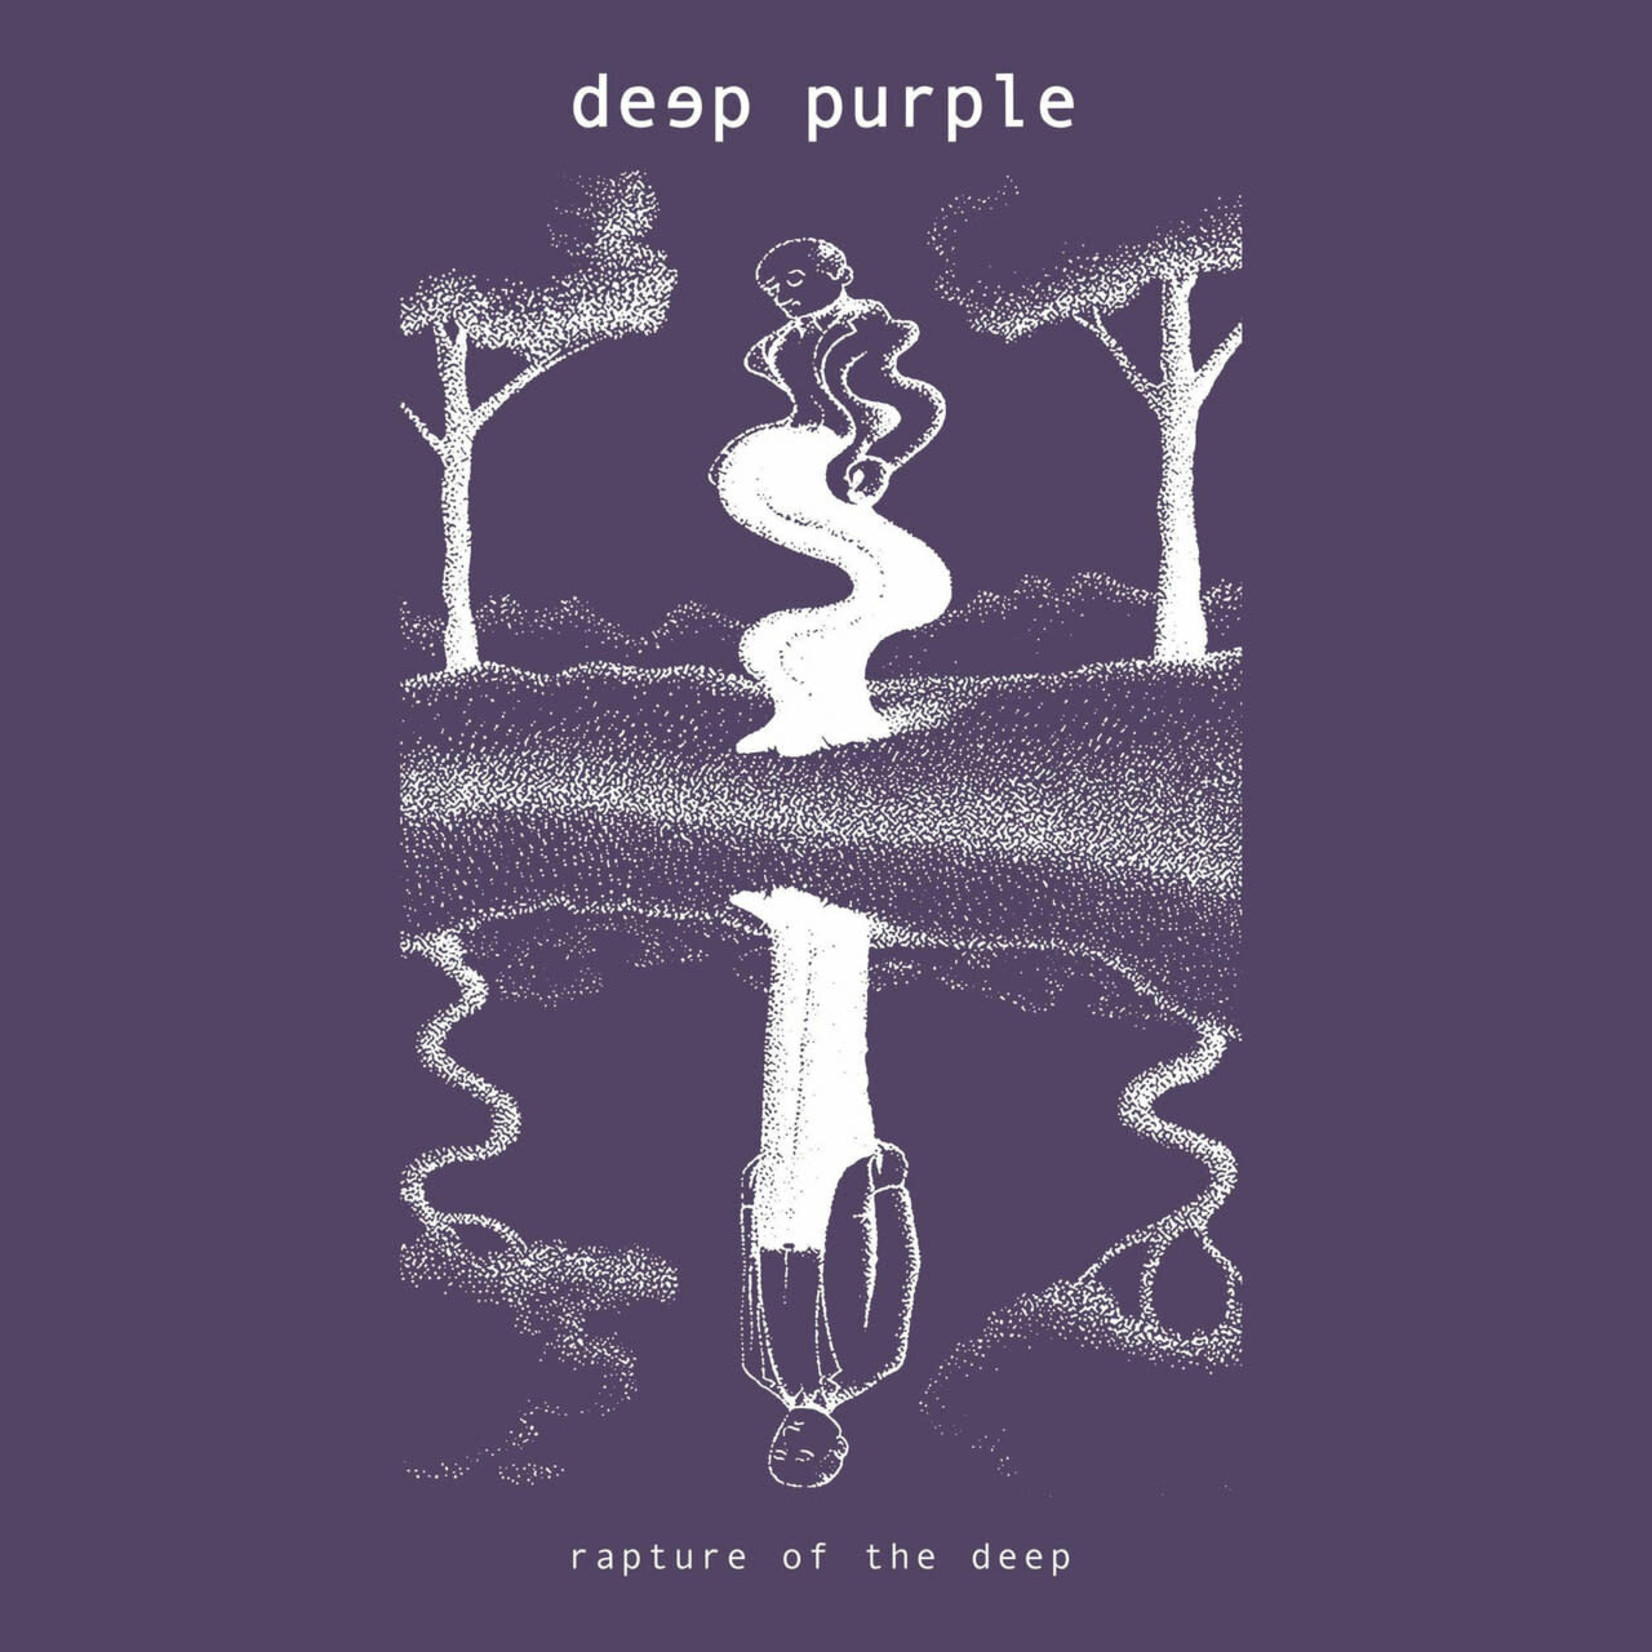 [New] Deep Purple: Rapture Of The Deep